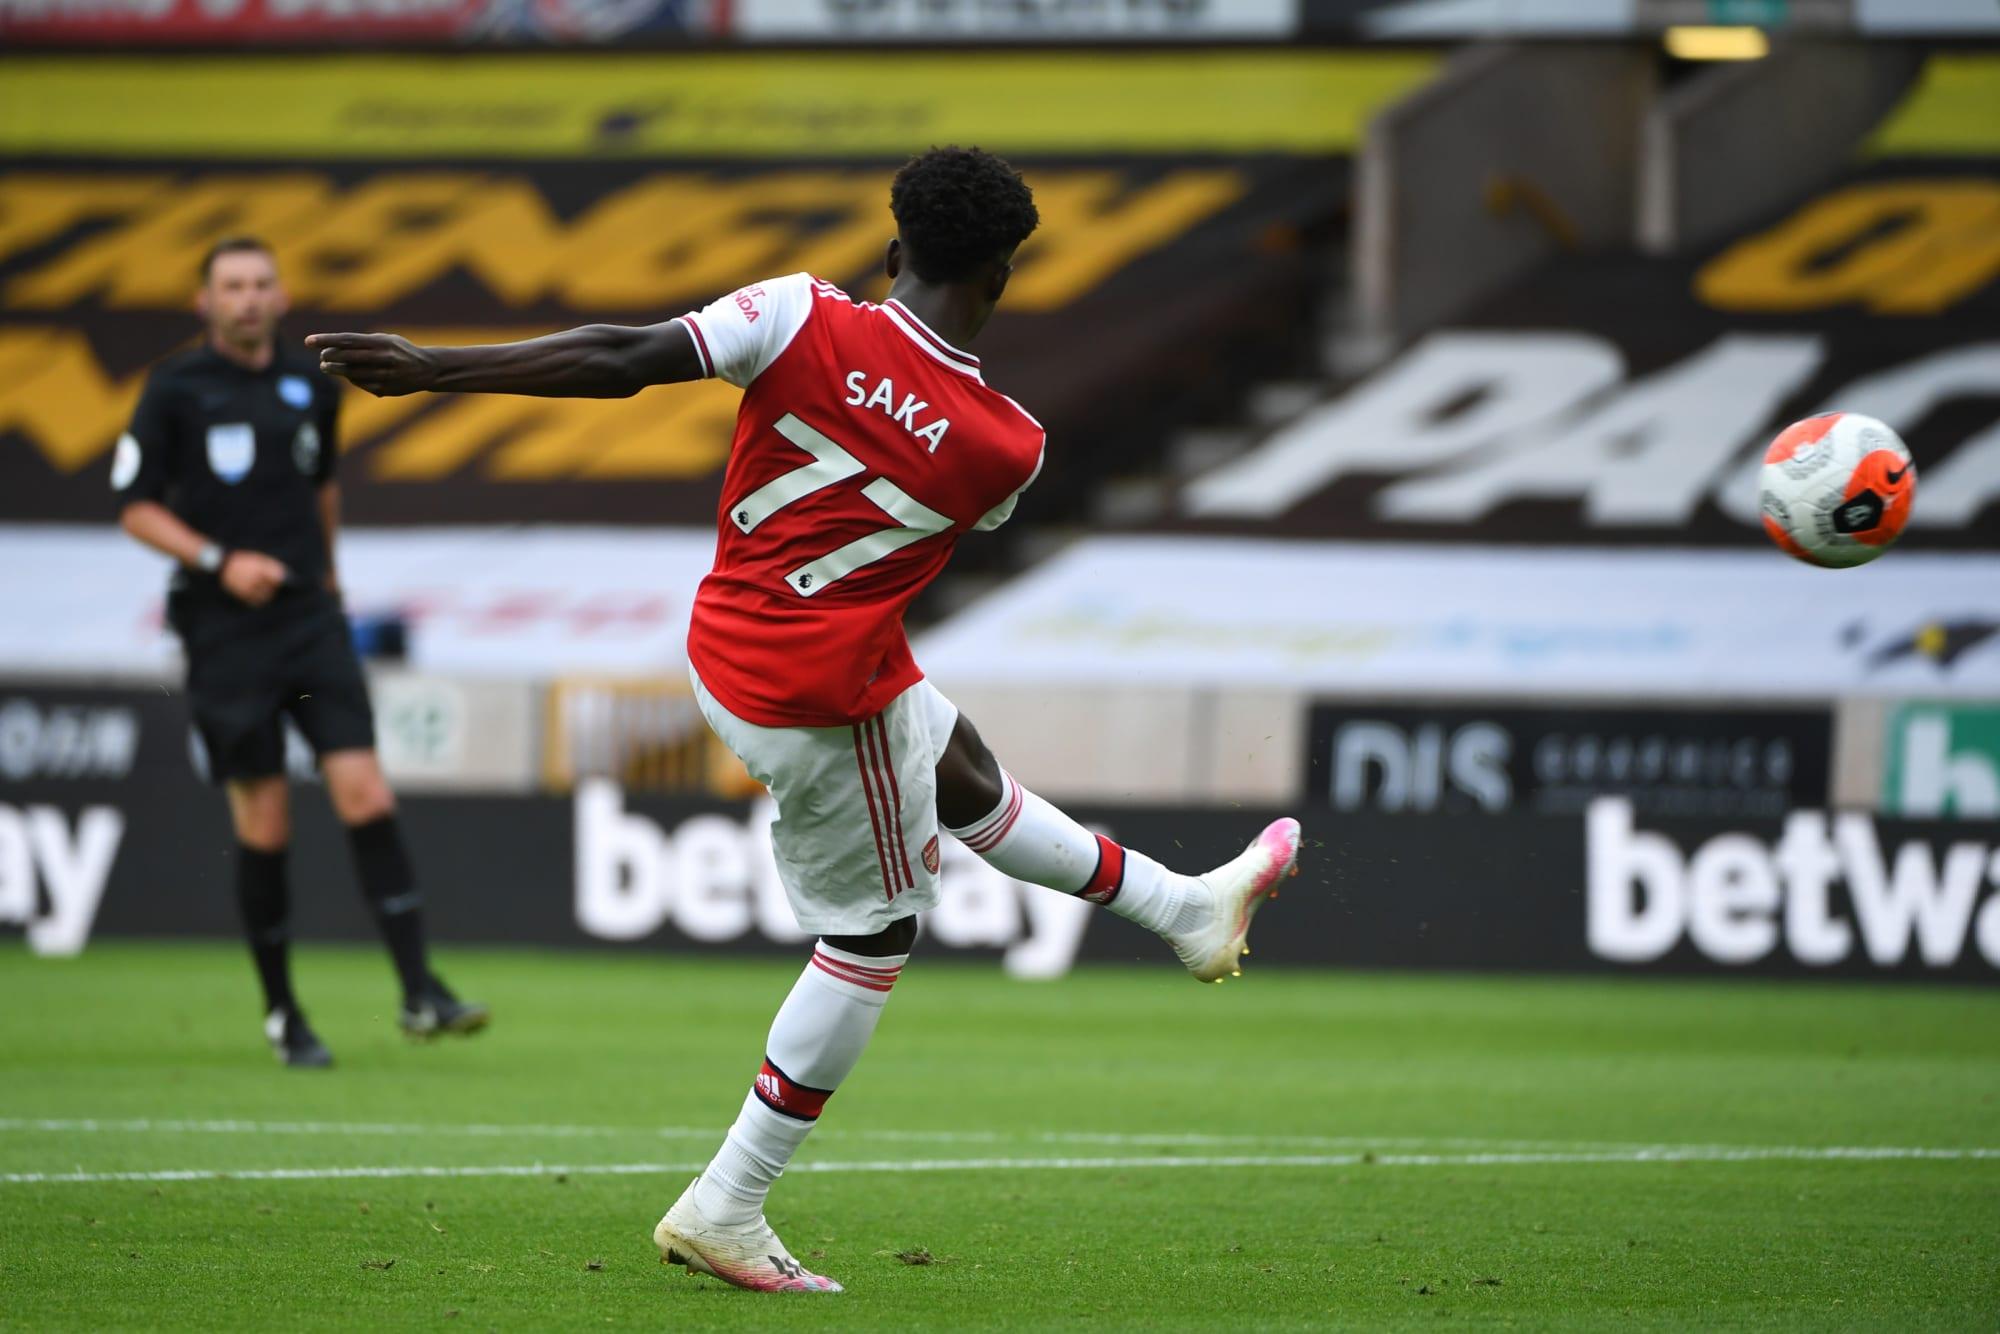 Arsenal: Where is Bukayo Saka's best position?